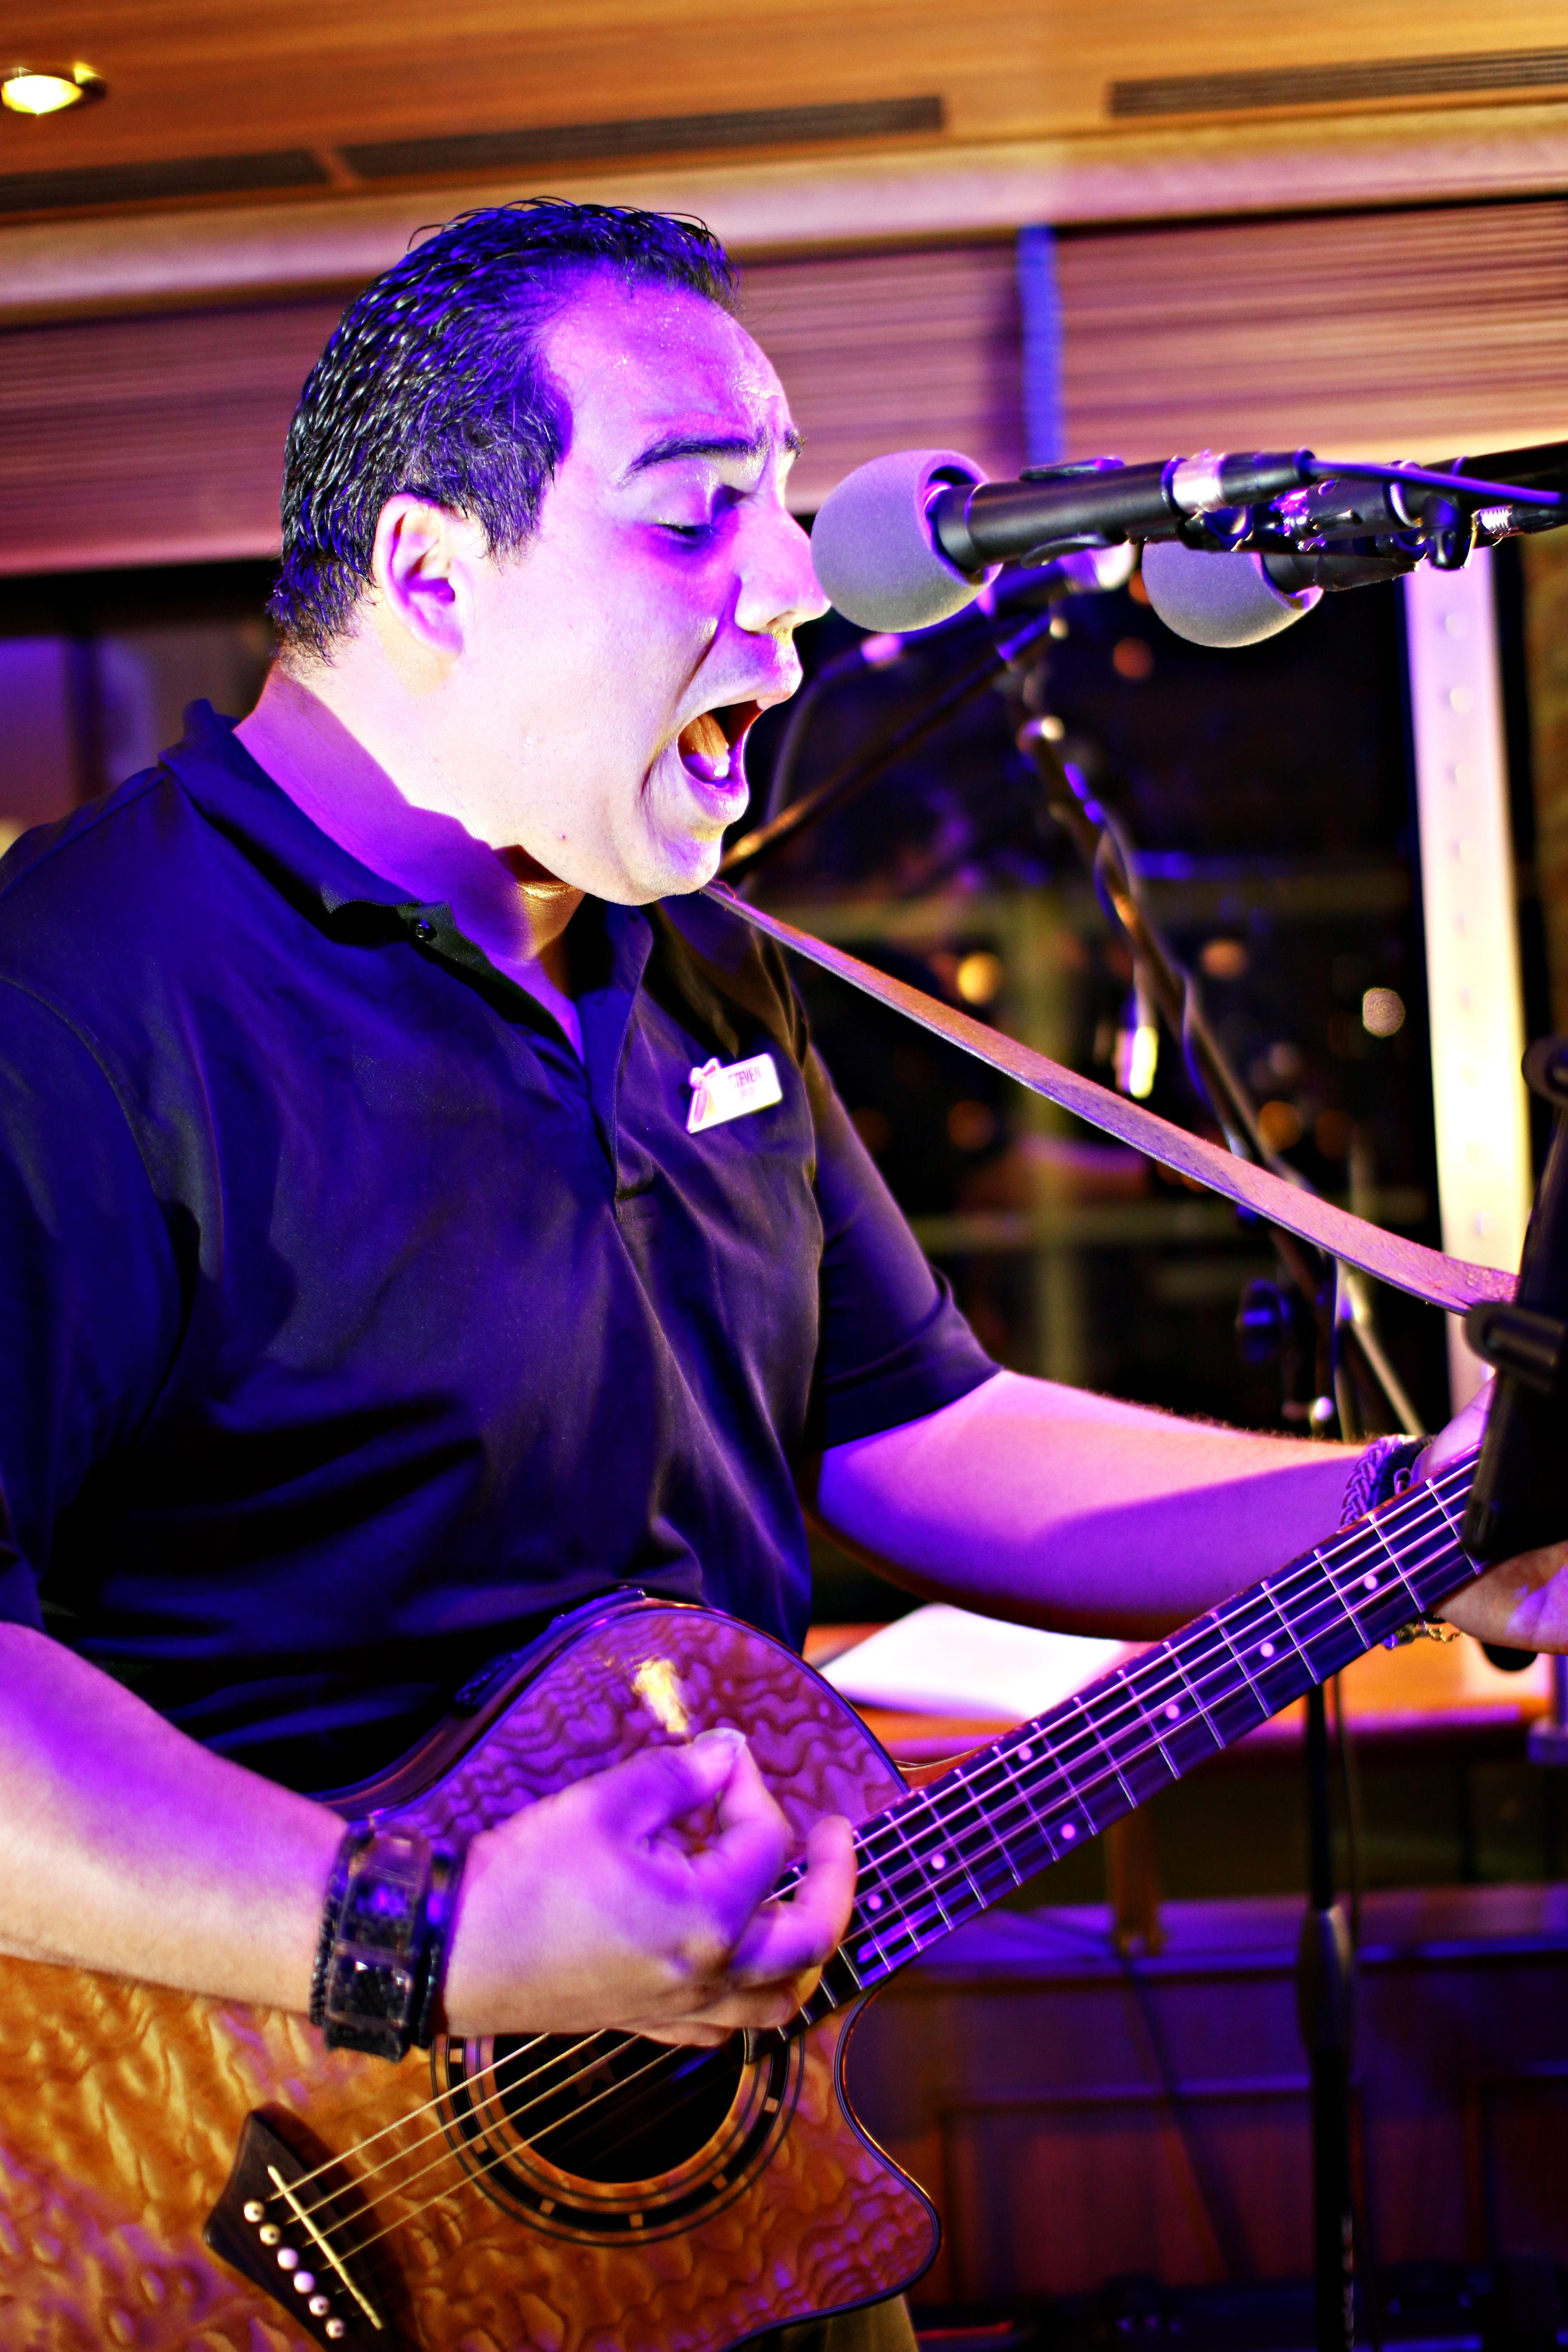 Carnival Cruise Guitar Soloist